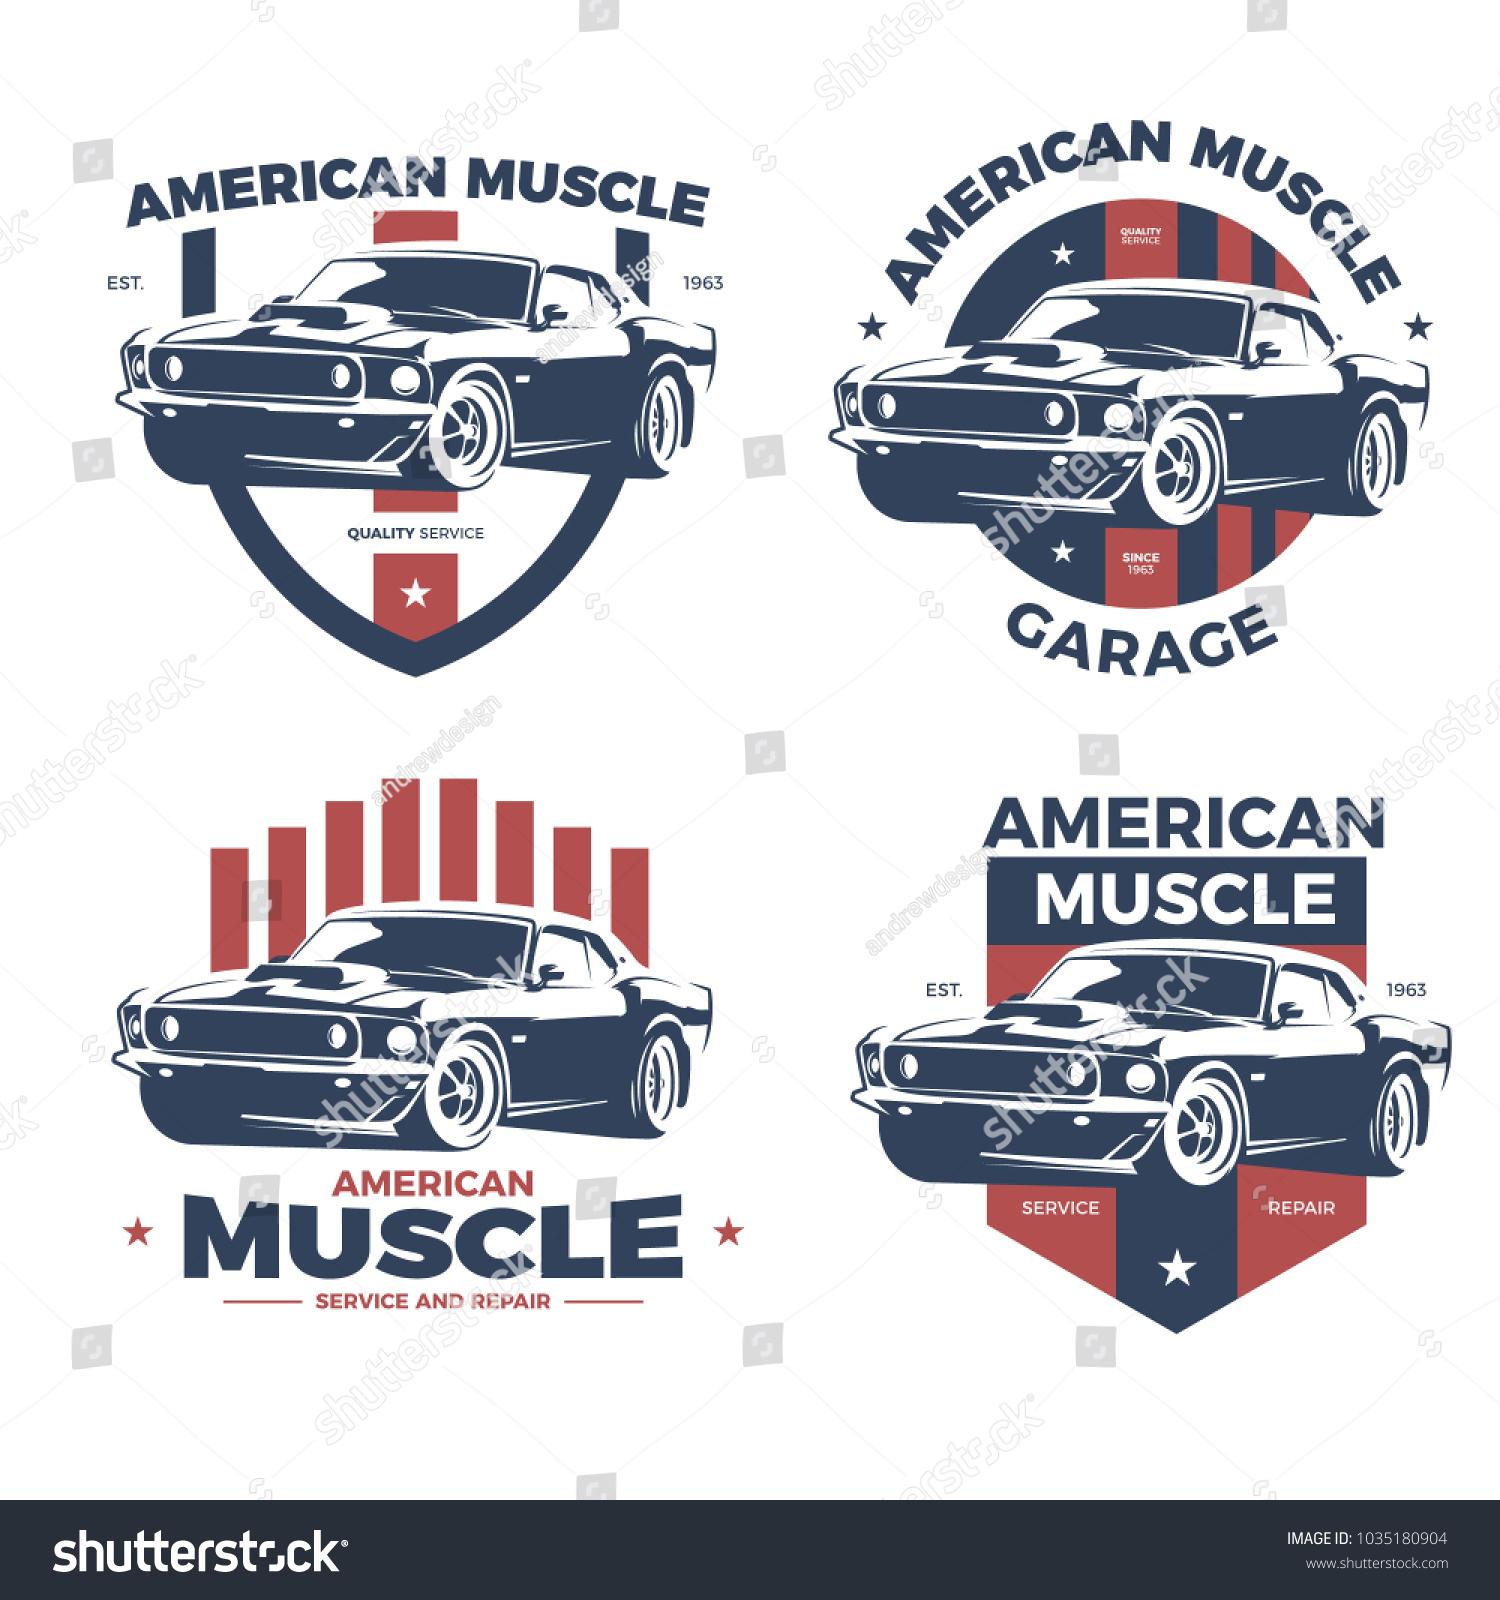 American Muscle Car Repair Service Logo Stock Vector 1035180904 ...